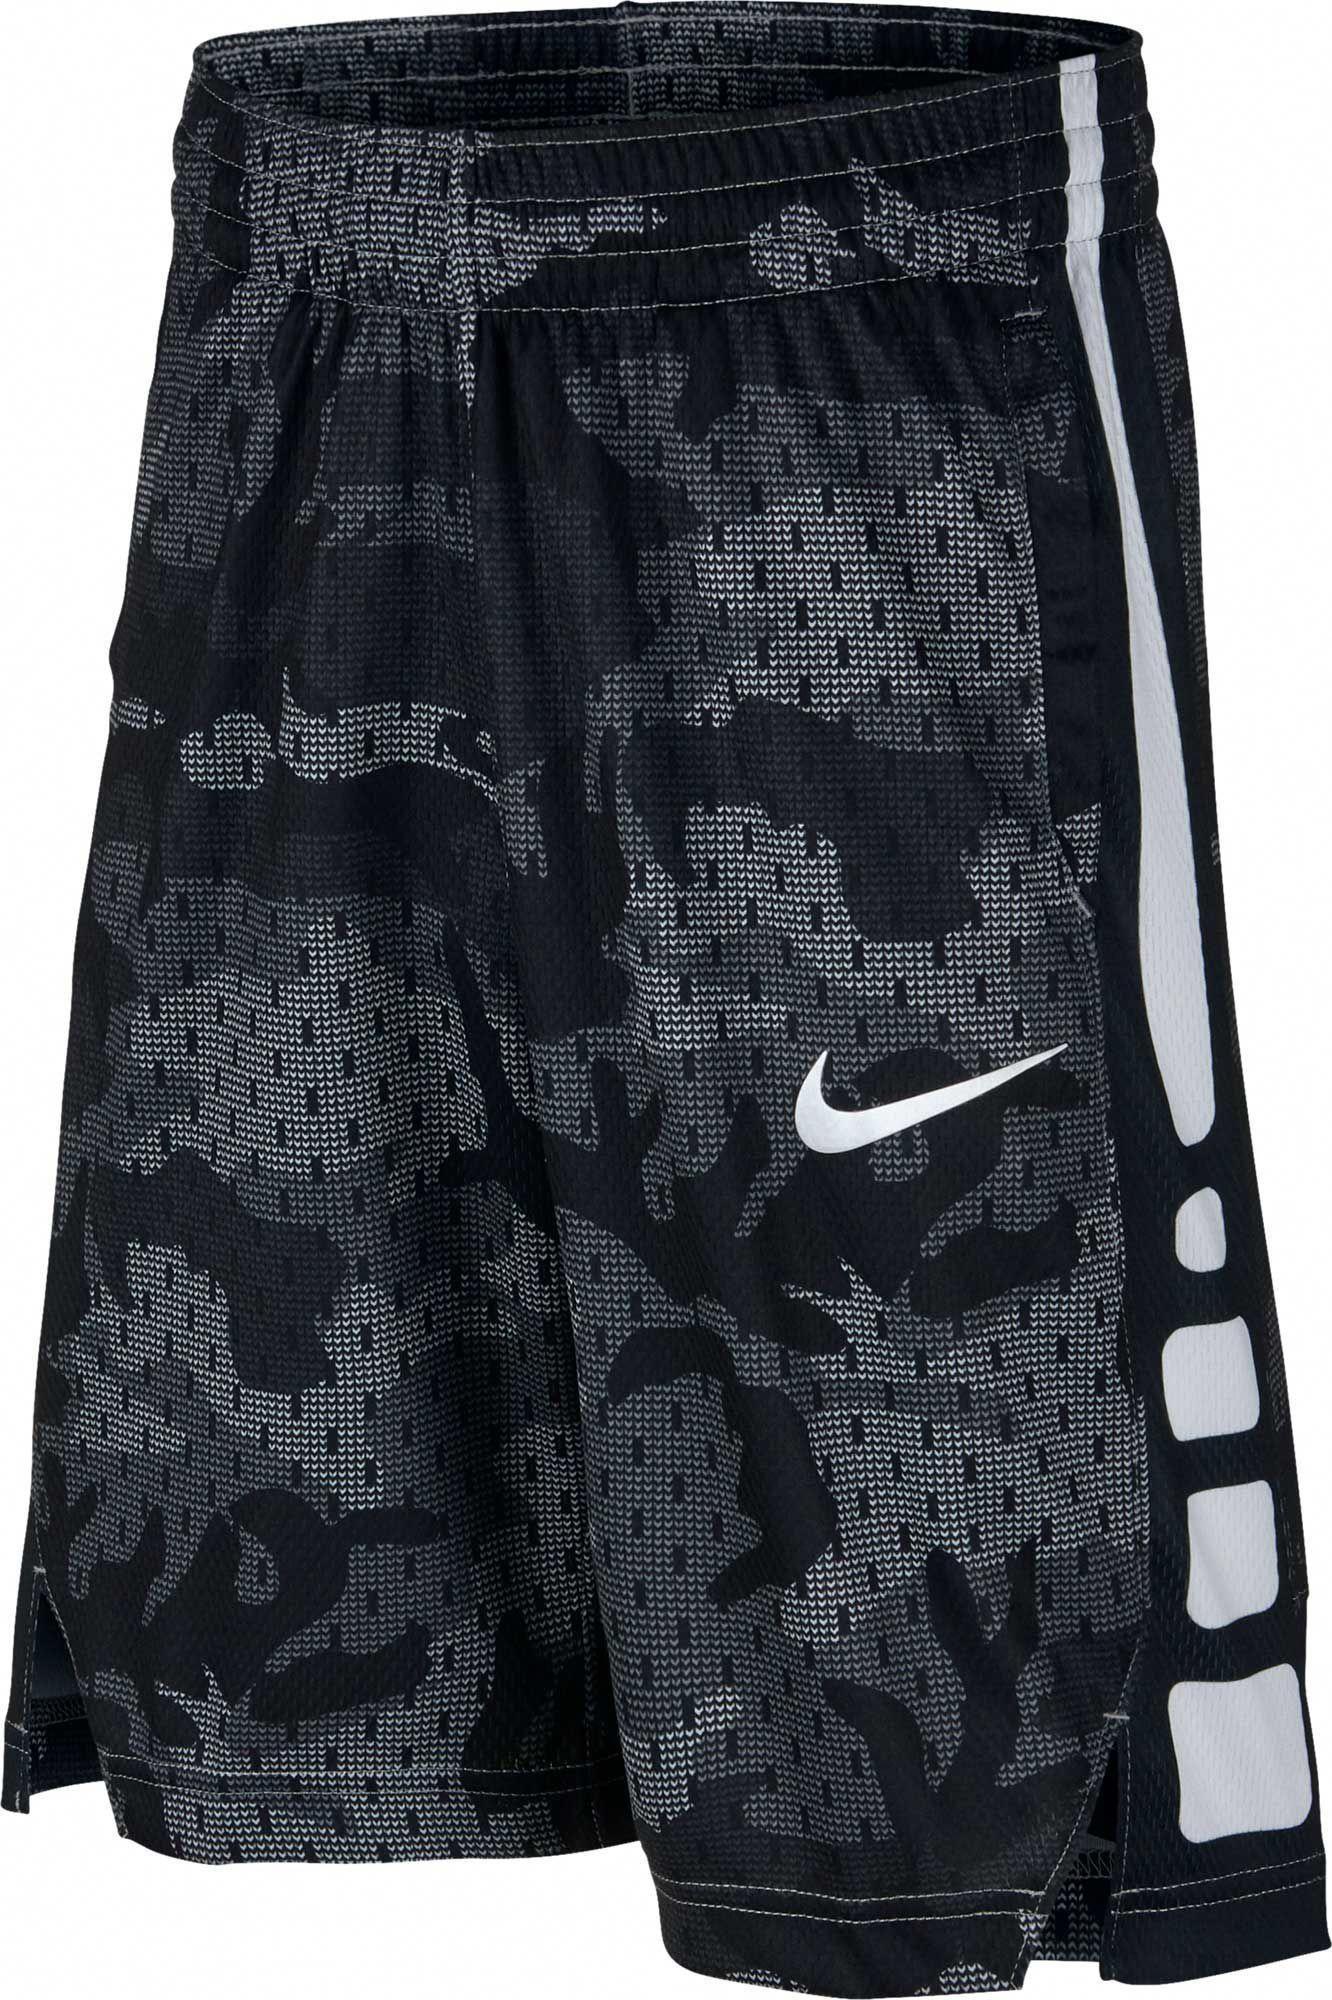 Nike Boys Dry Elite Camo Print Basketball Shorts Nike Basketball Shorts Basketball Shorts Basketball Clothes